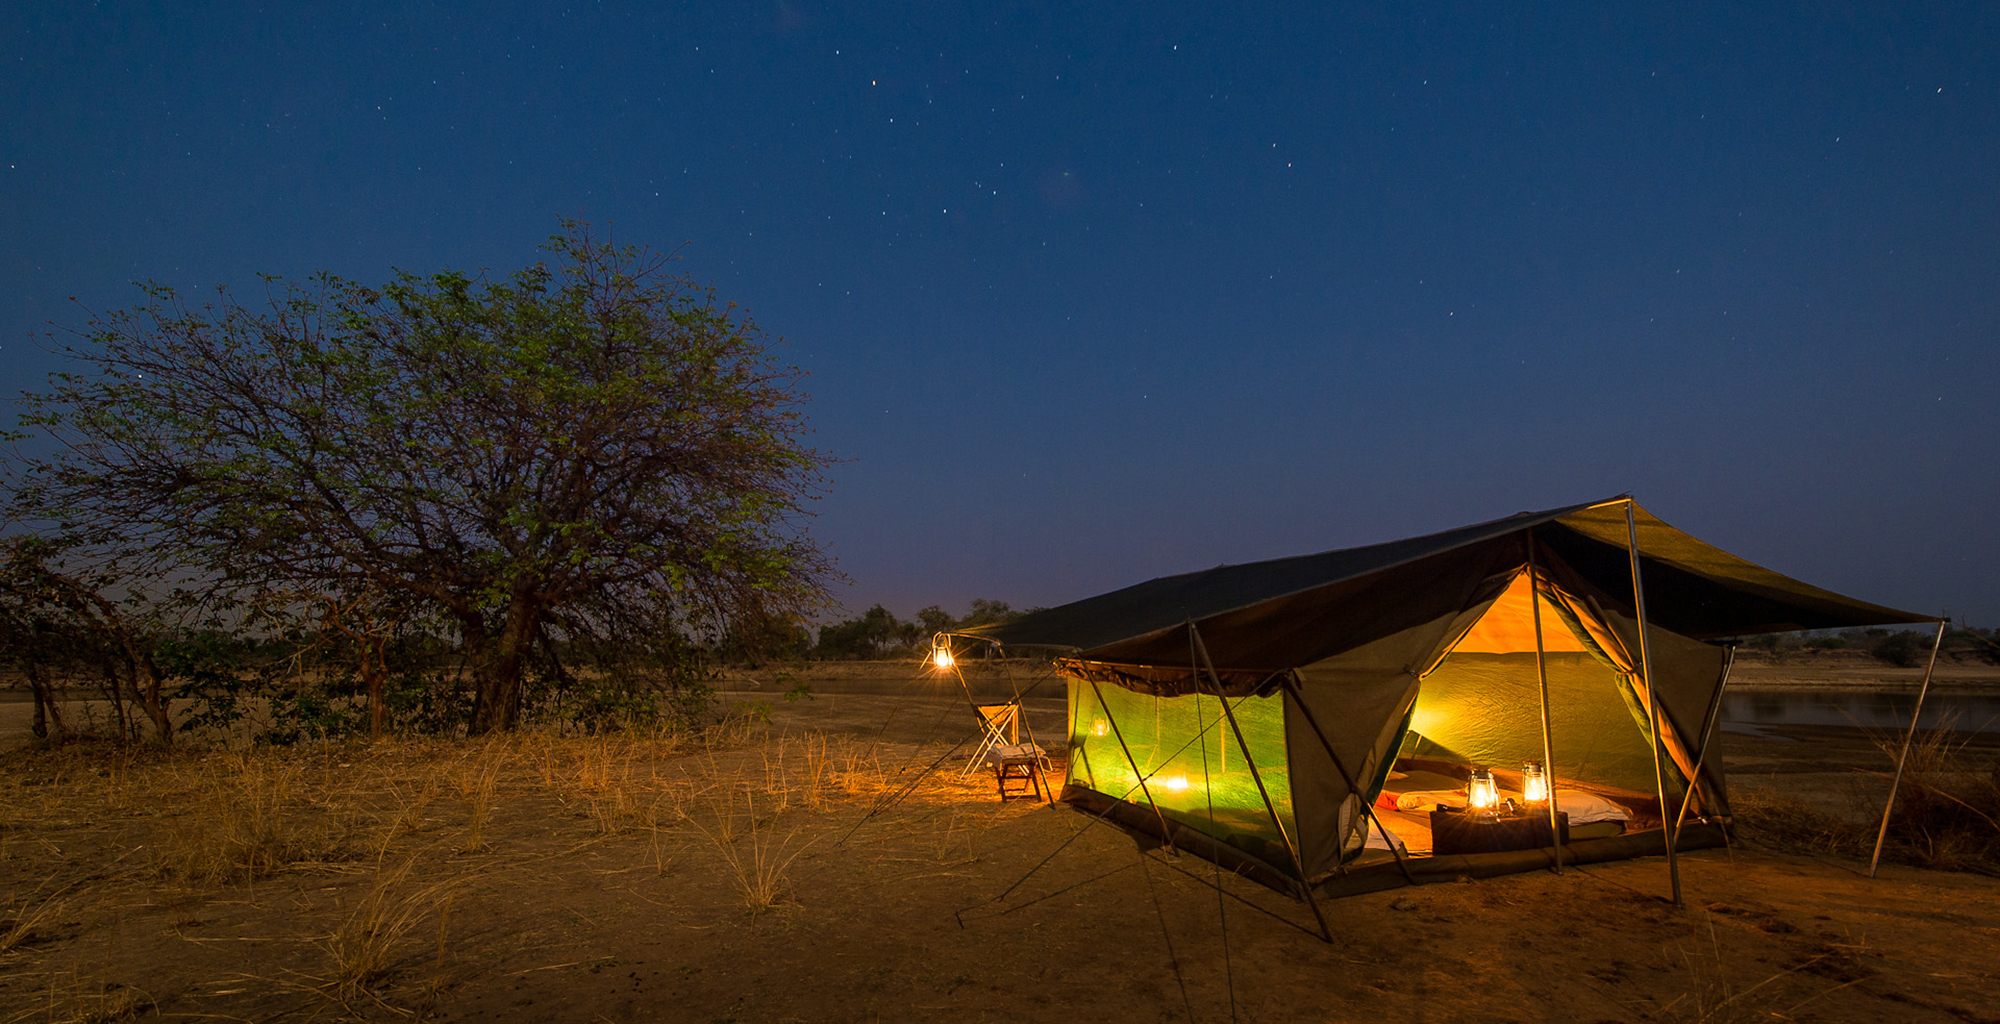 Zambia-Luangwa-Bush-Camp-Exterior